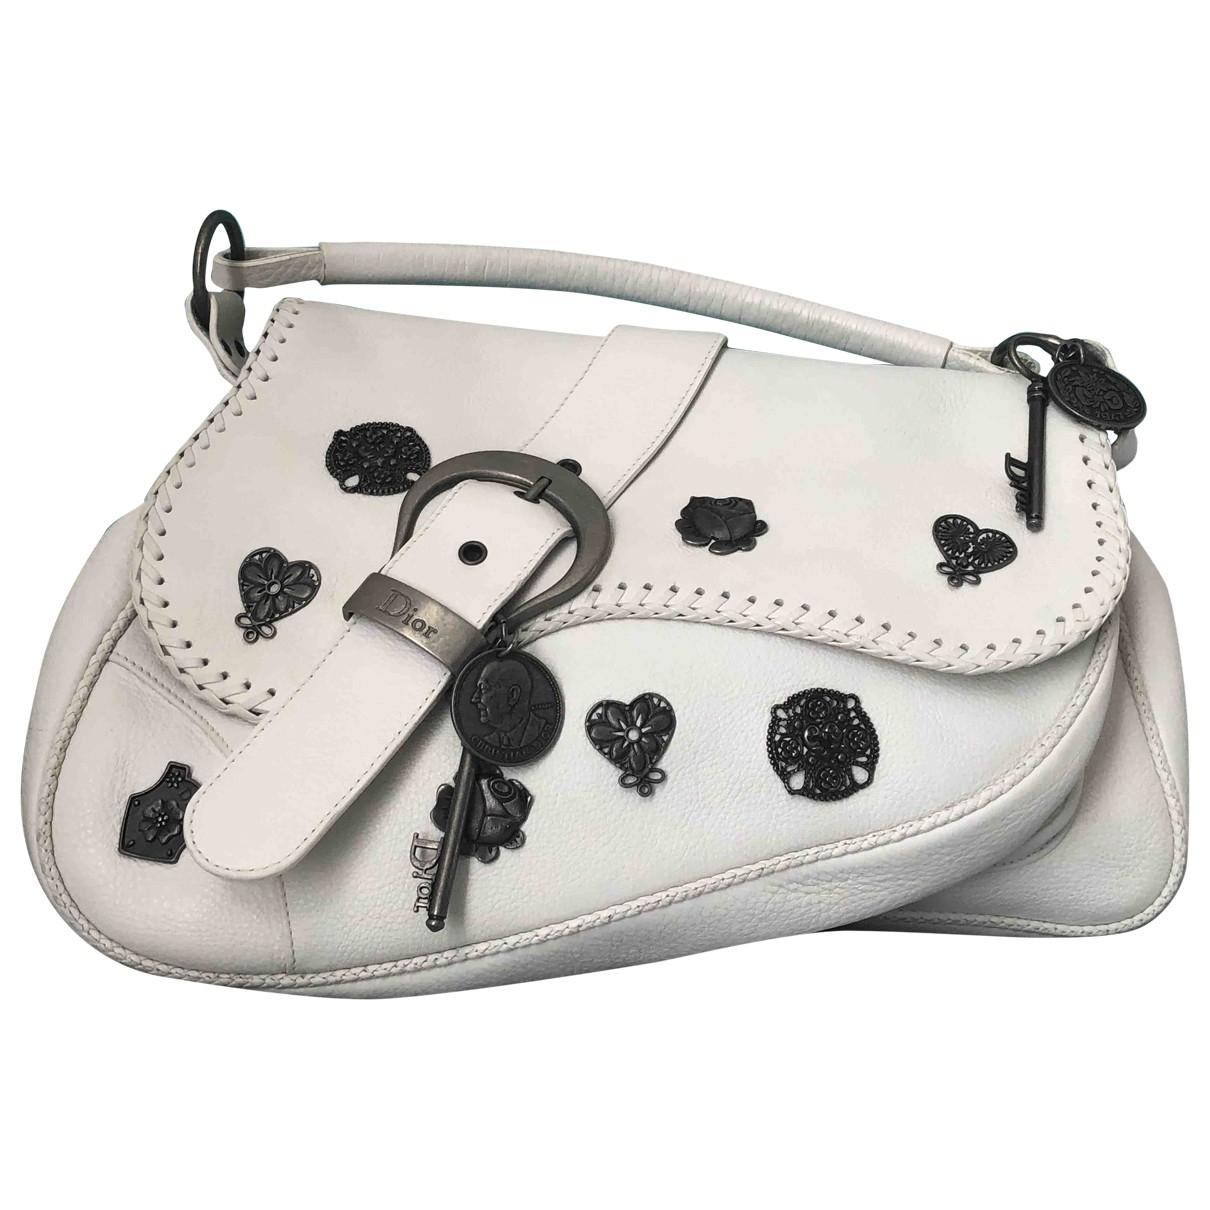 Dior Saddle White Leather handbag for Women \N